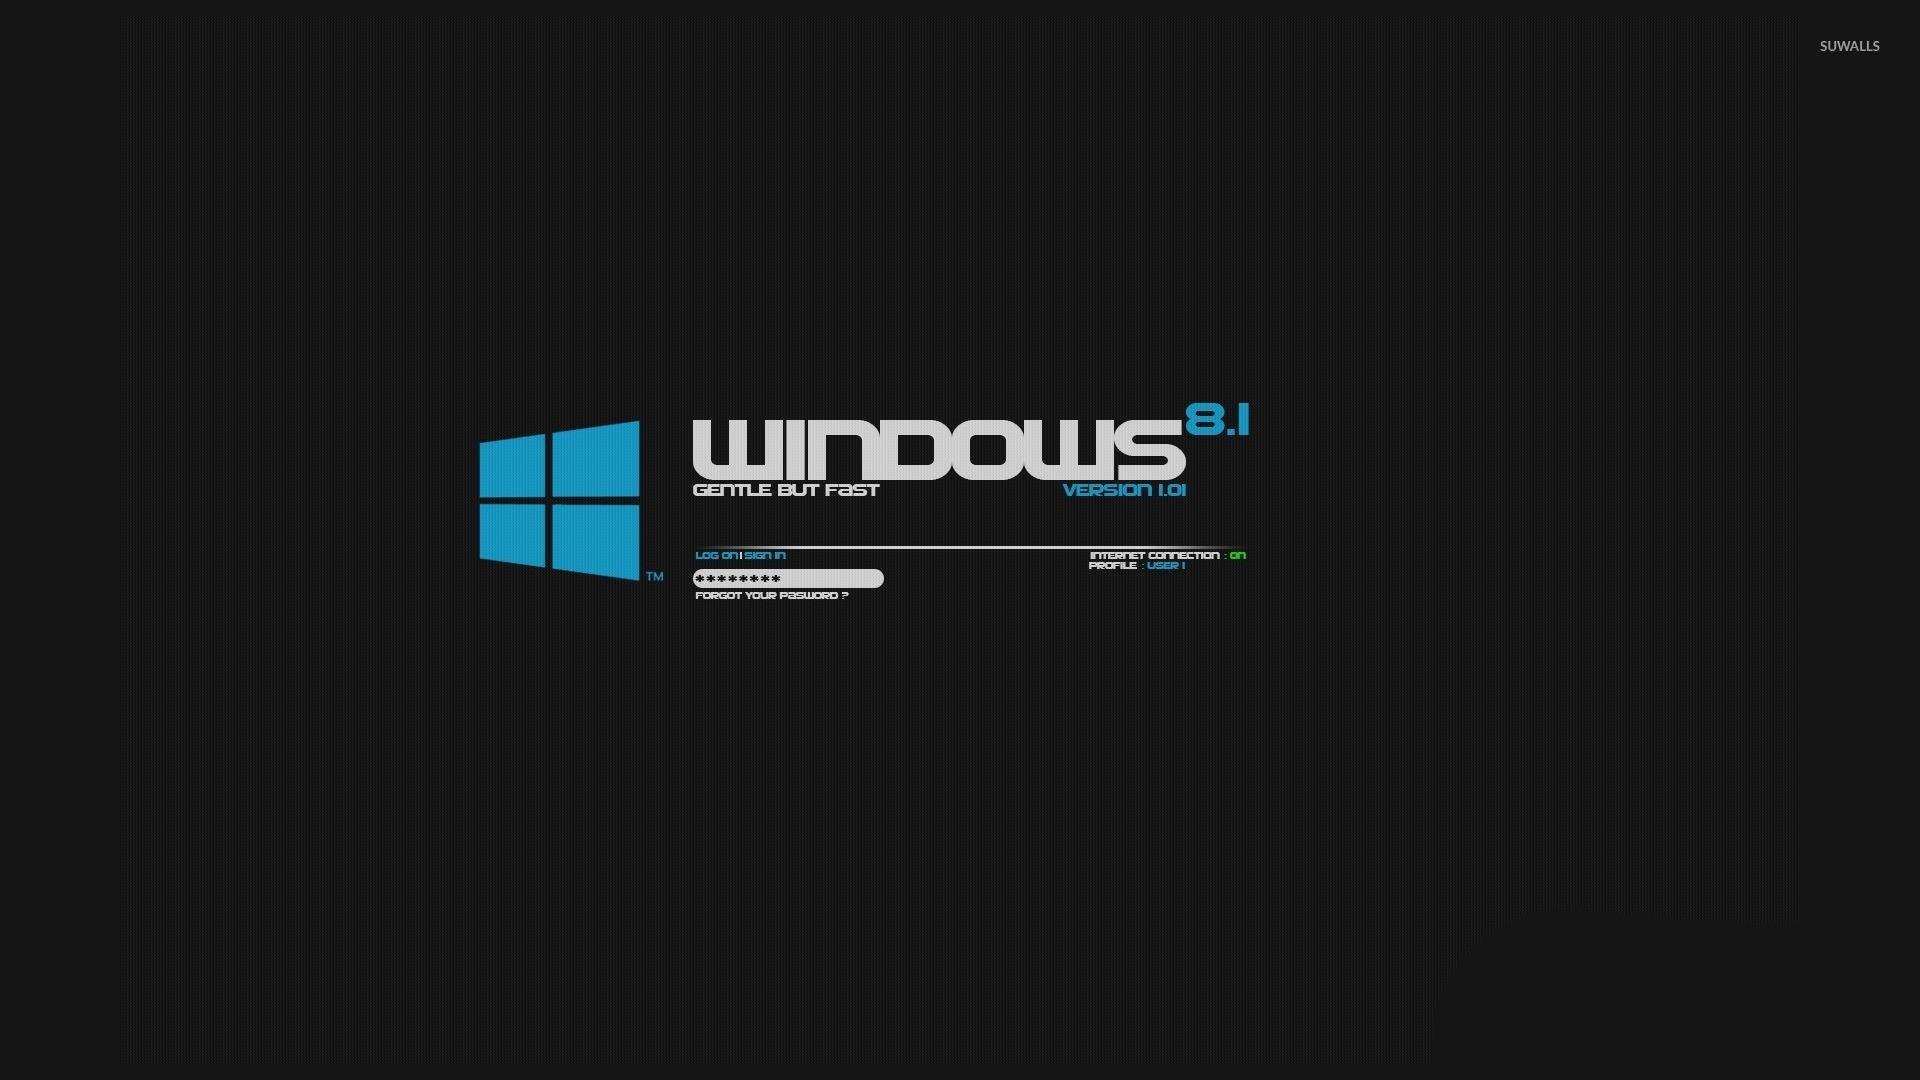 Windows  Wallpaper Computer Wallpapers  X